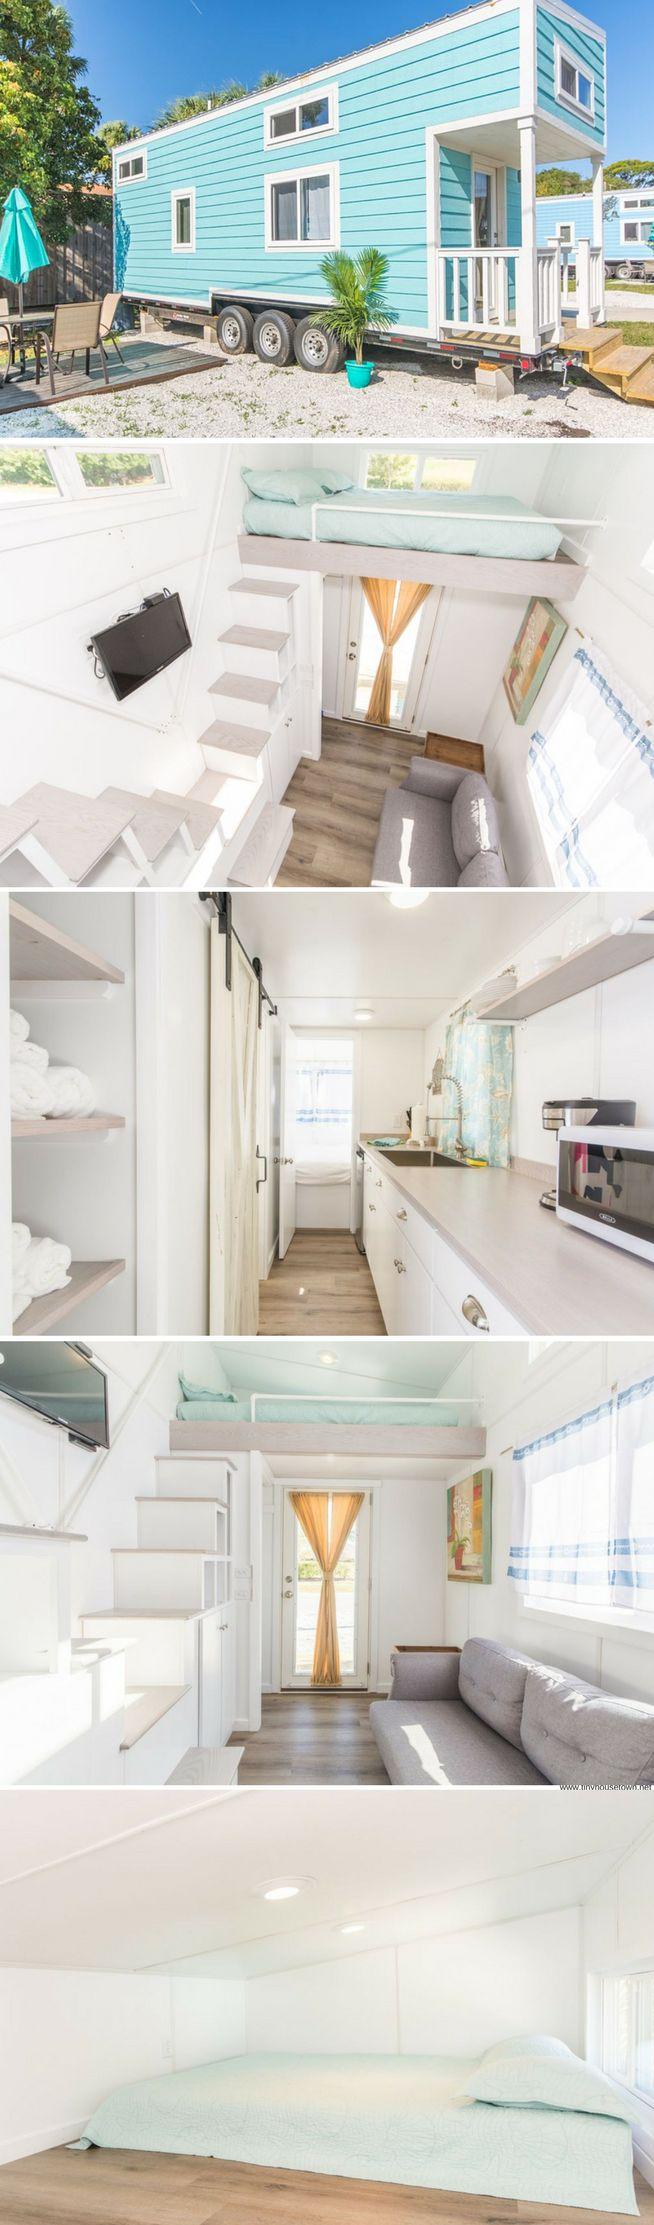 415 best Tiny House Design images on Pinterest | Tiny house living ...